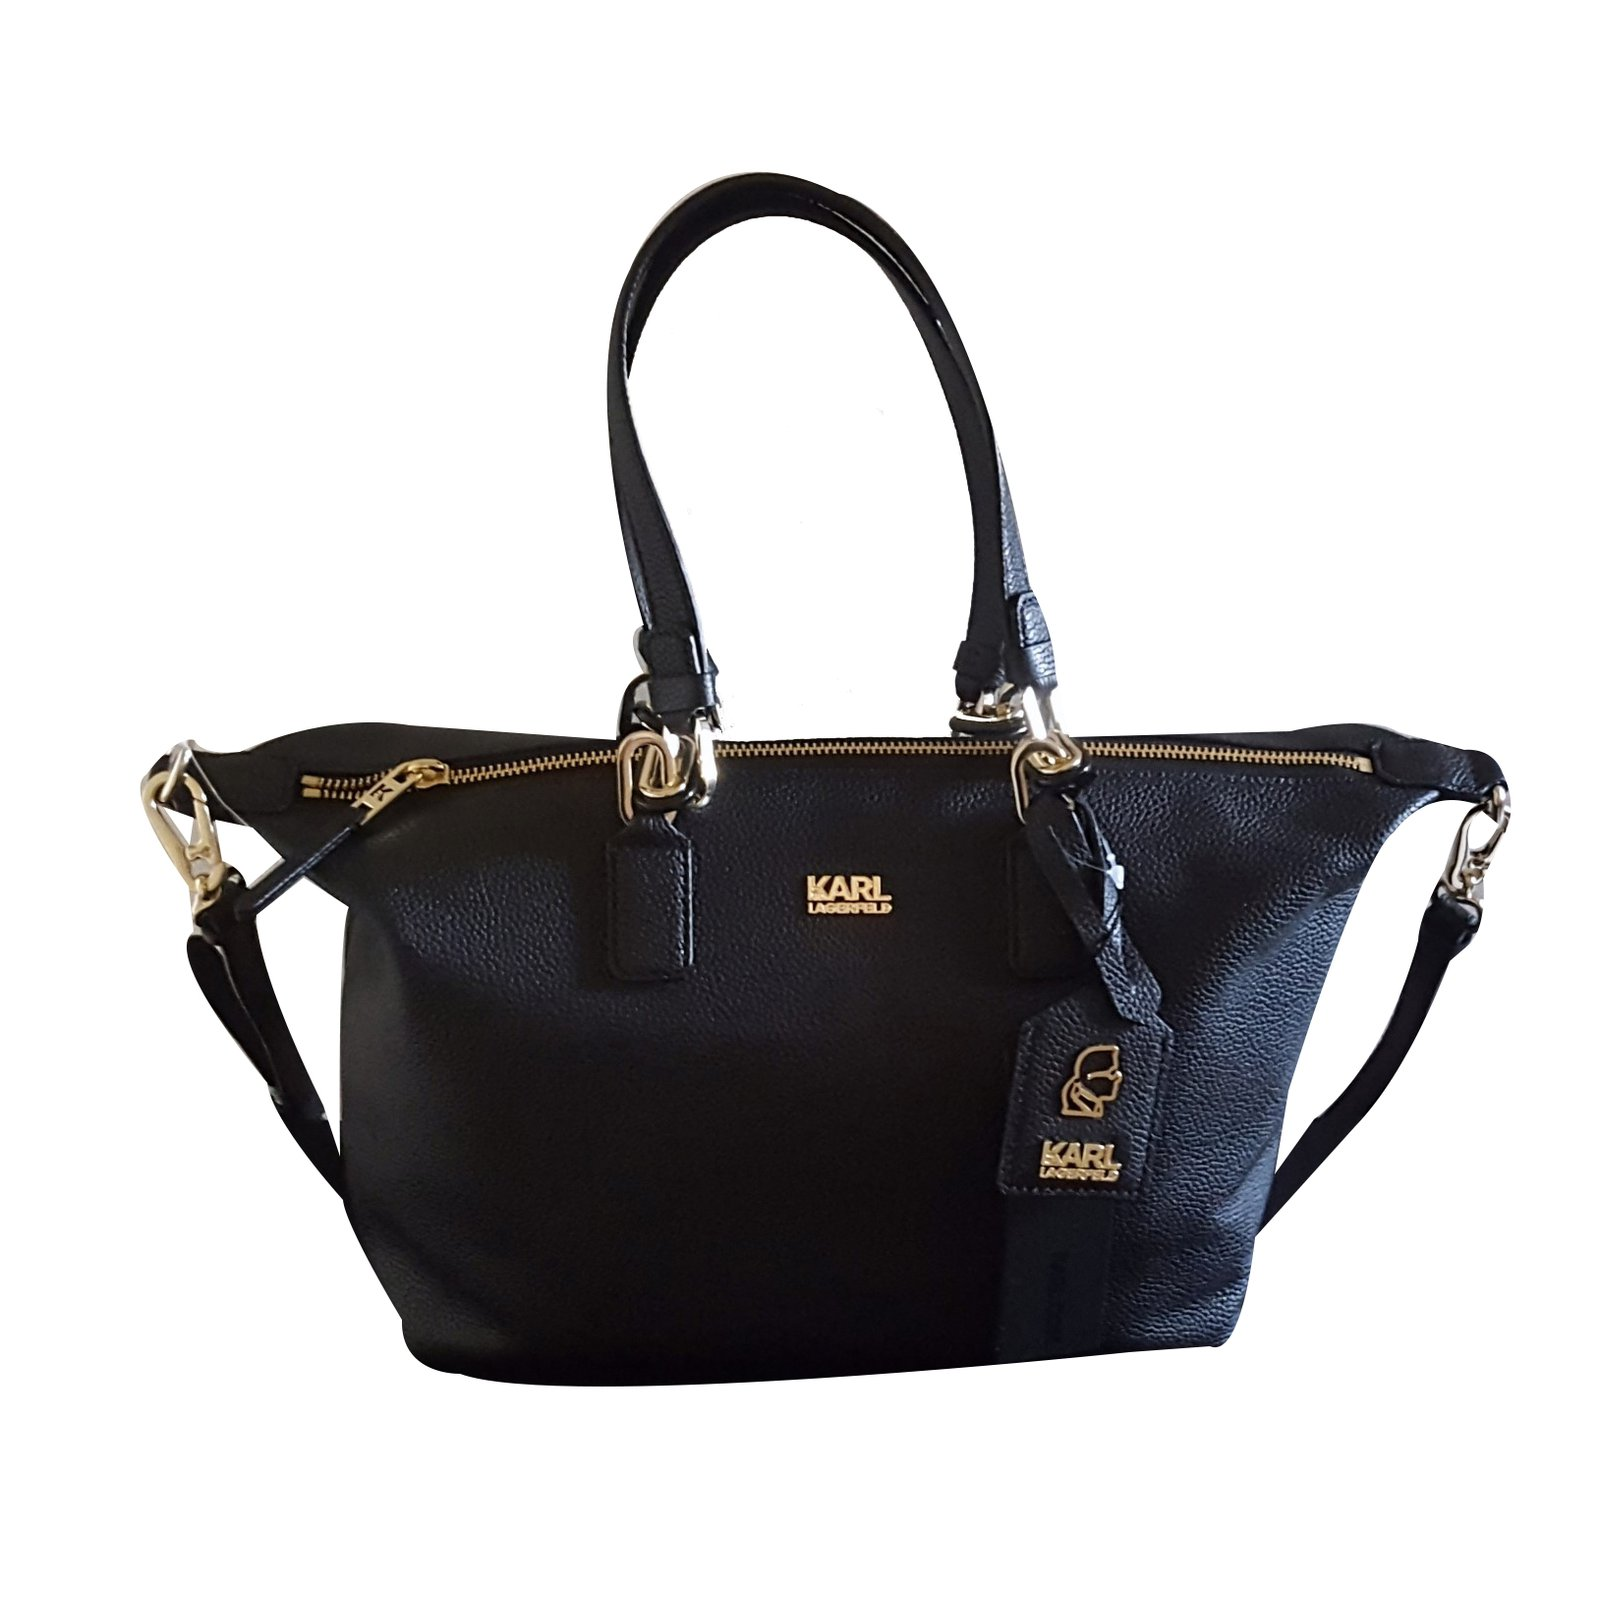 Karl Lagerfeld Handbag Handbags Leather Black Ref 30948